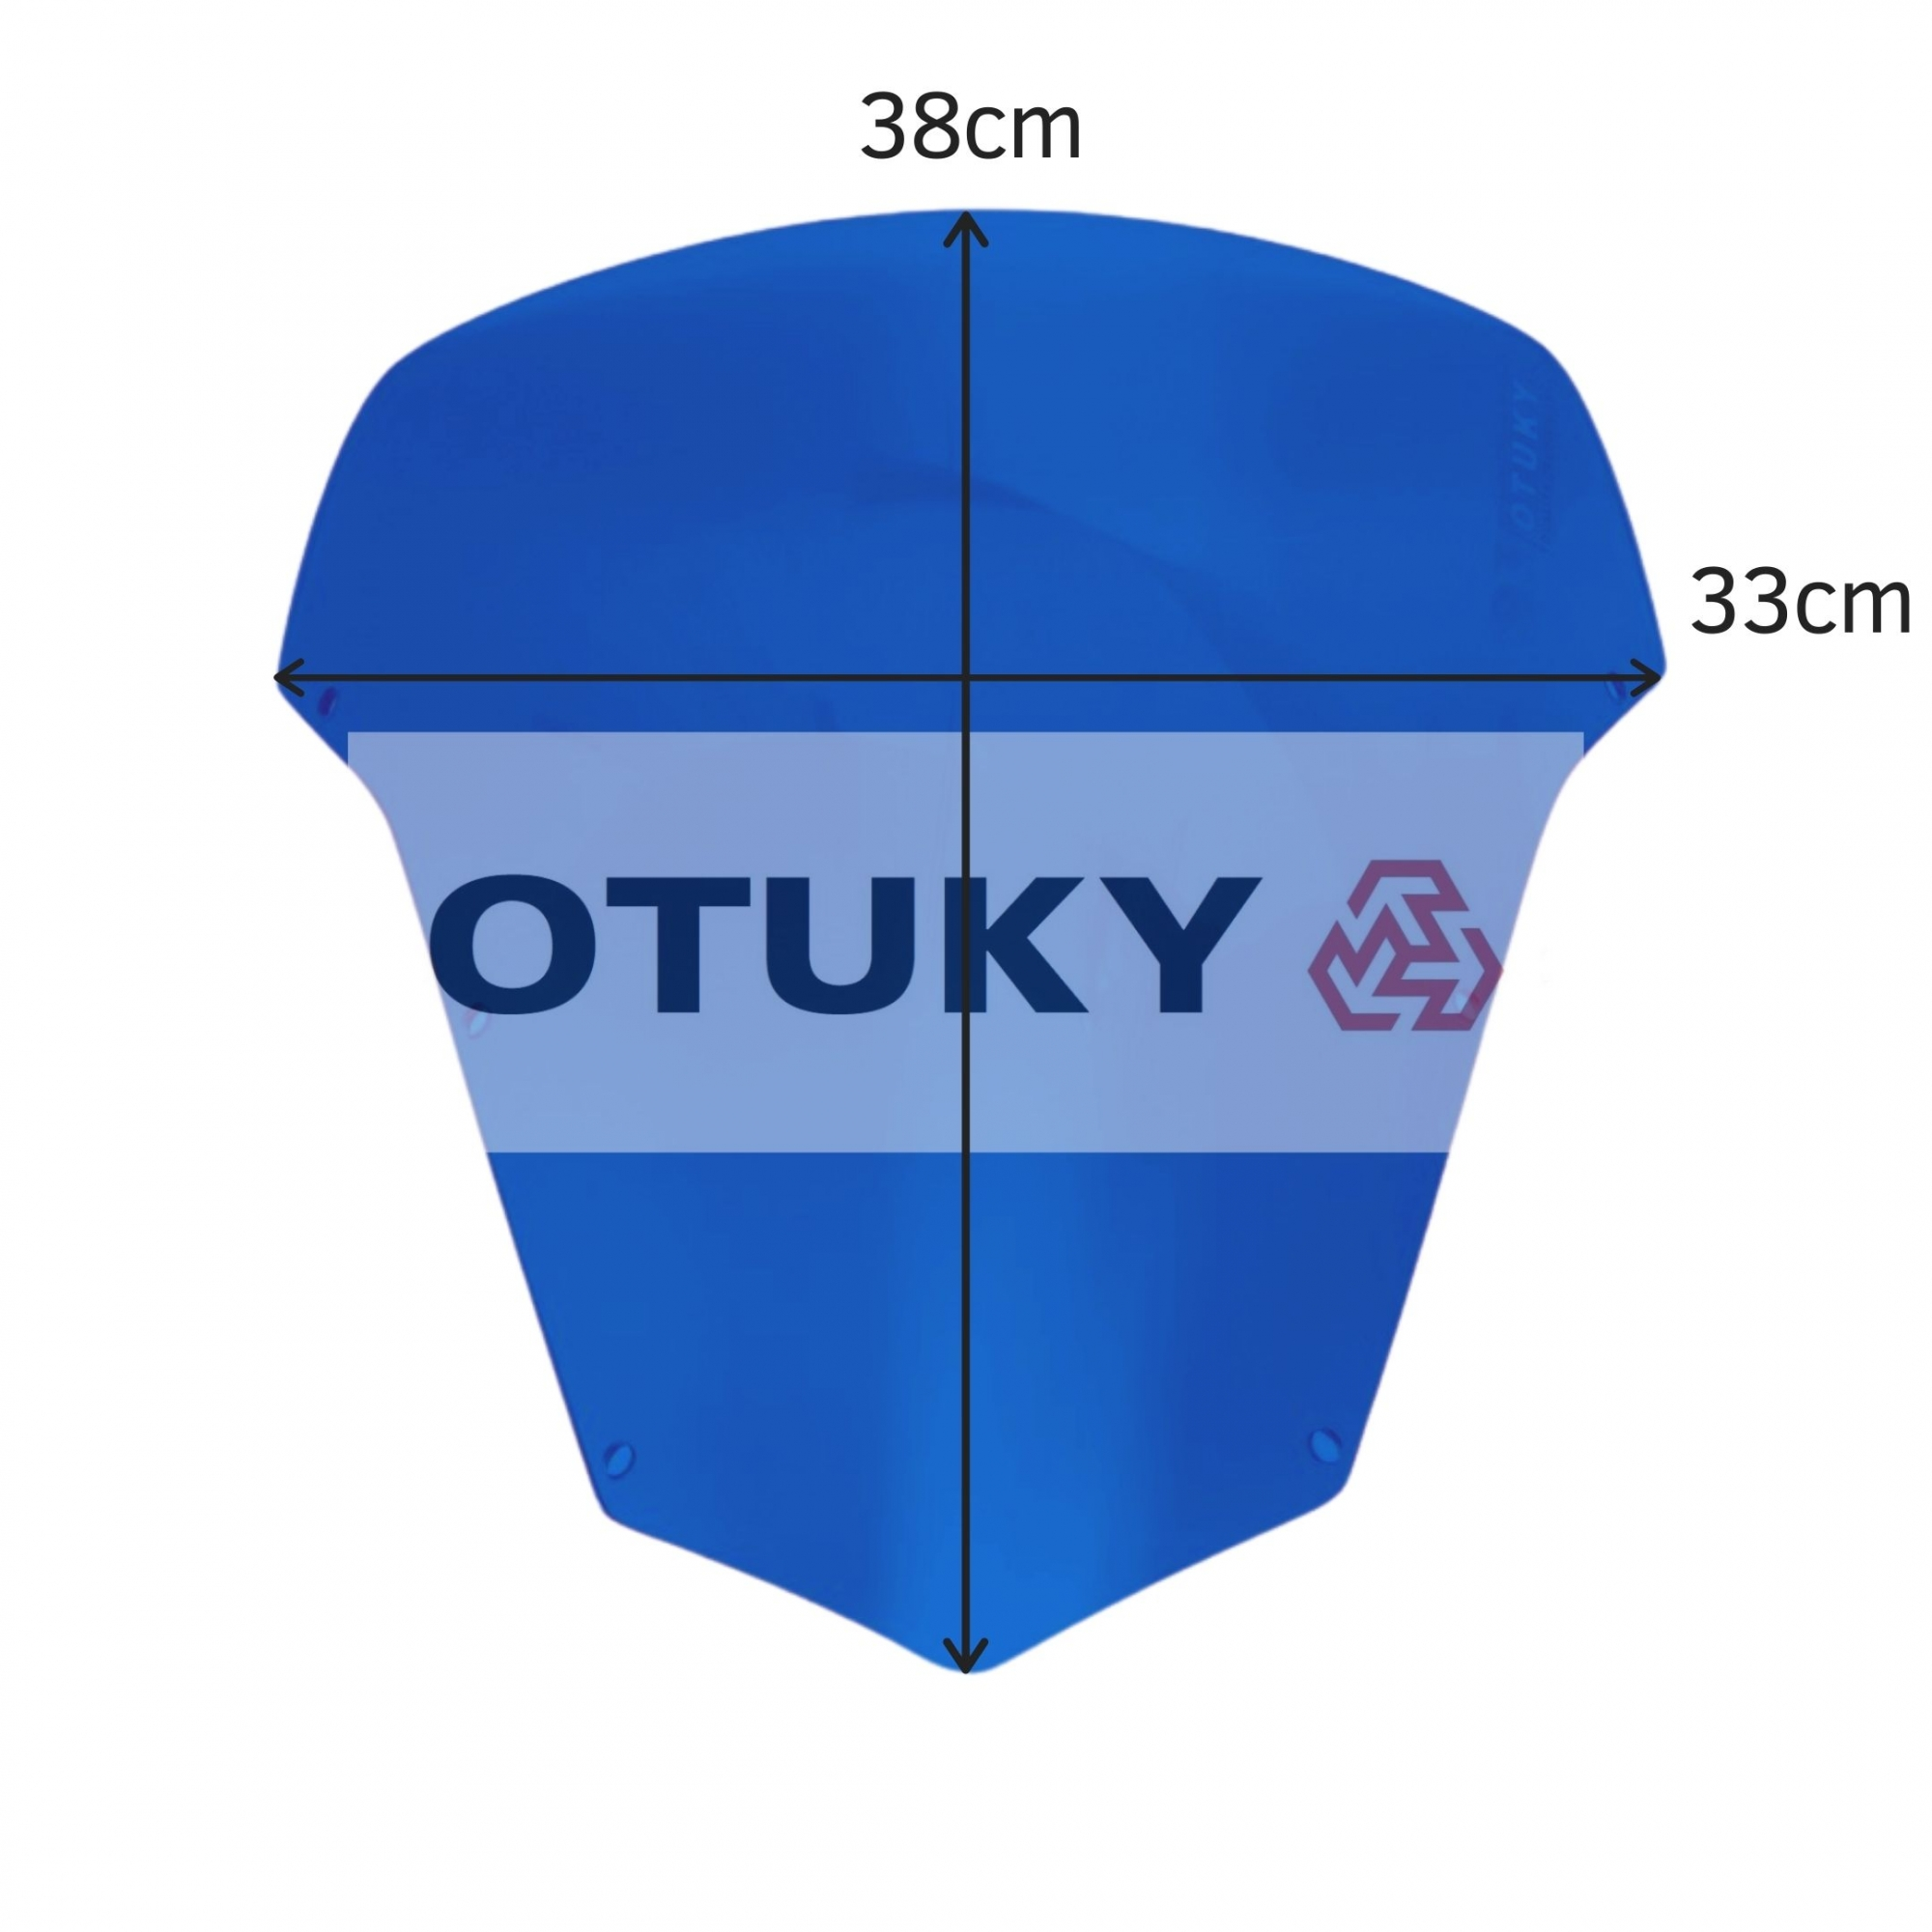 Bolha para Moto Fazer 600 FZ 6 S 2007 2008 2009 2010 Otuky Azul Escuro